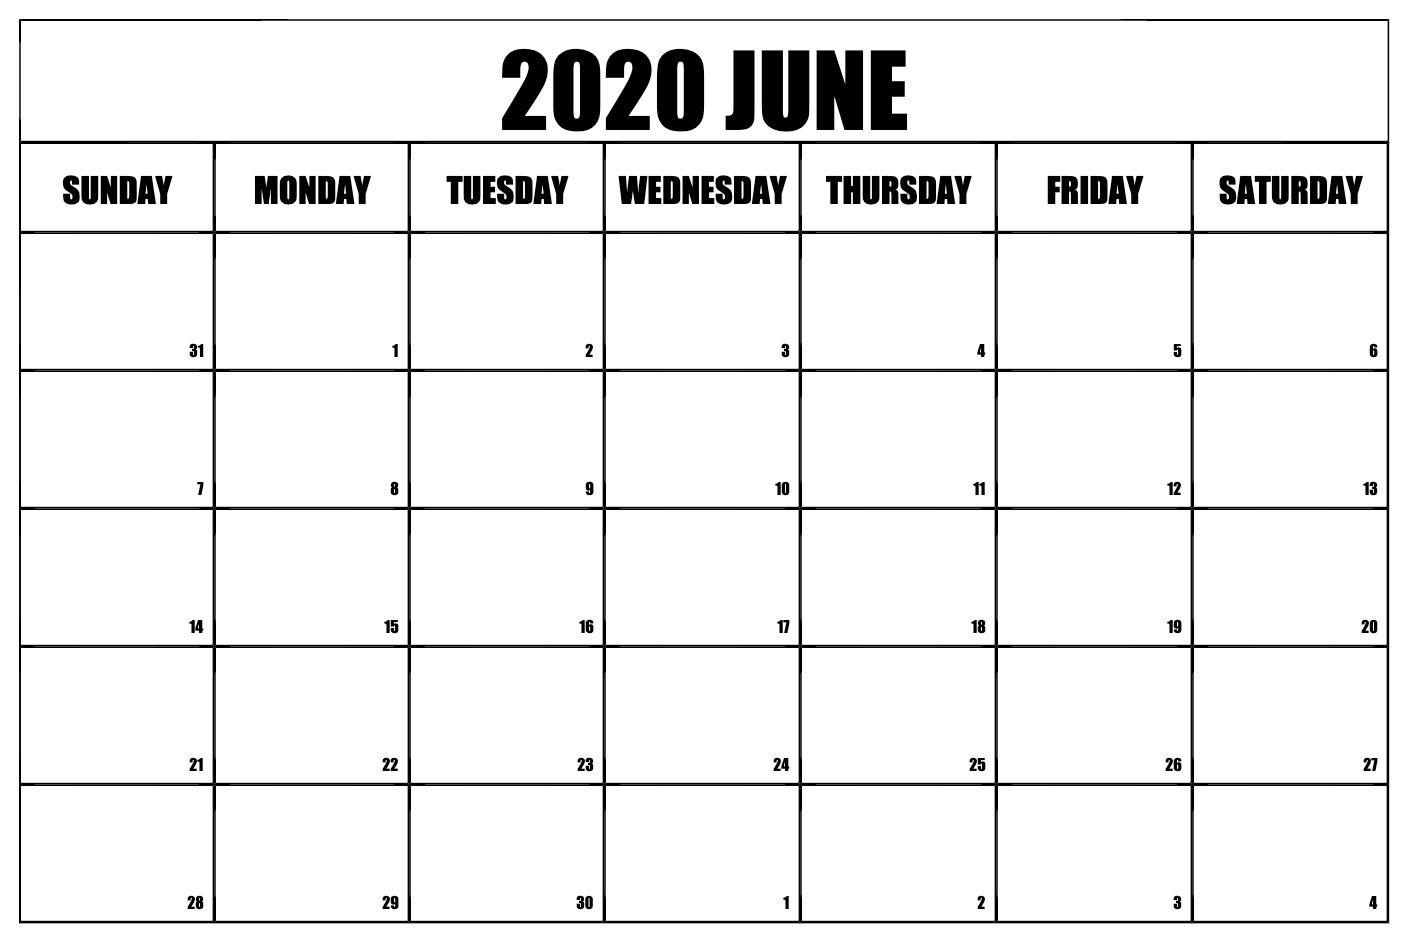 Free Printable June 2020 Calendar Calendar Printables 2020